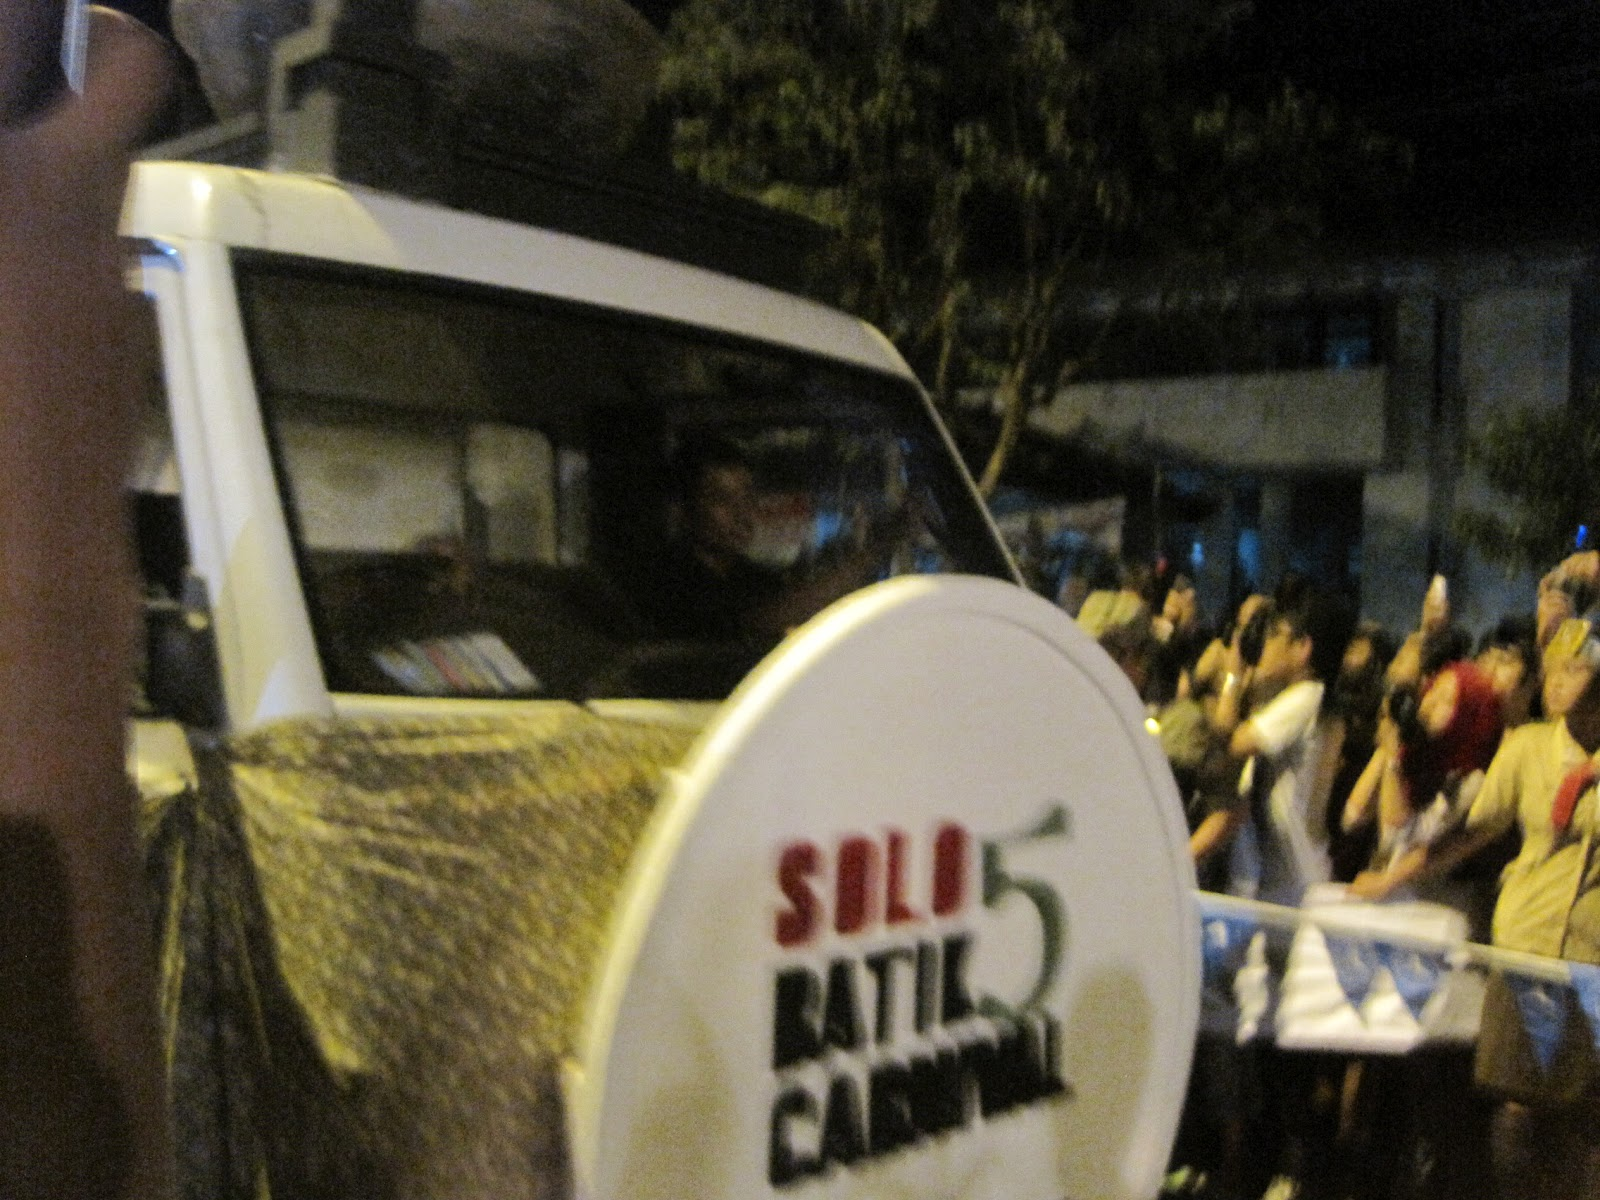 1600 x 1200 · 358 kB · jpeg, Solo Batik Carnival 2012 Berlangsung